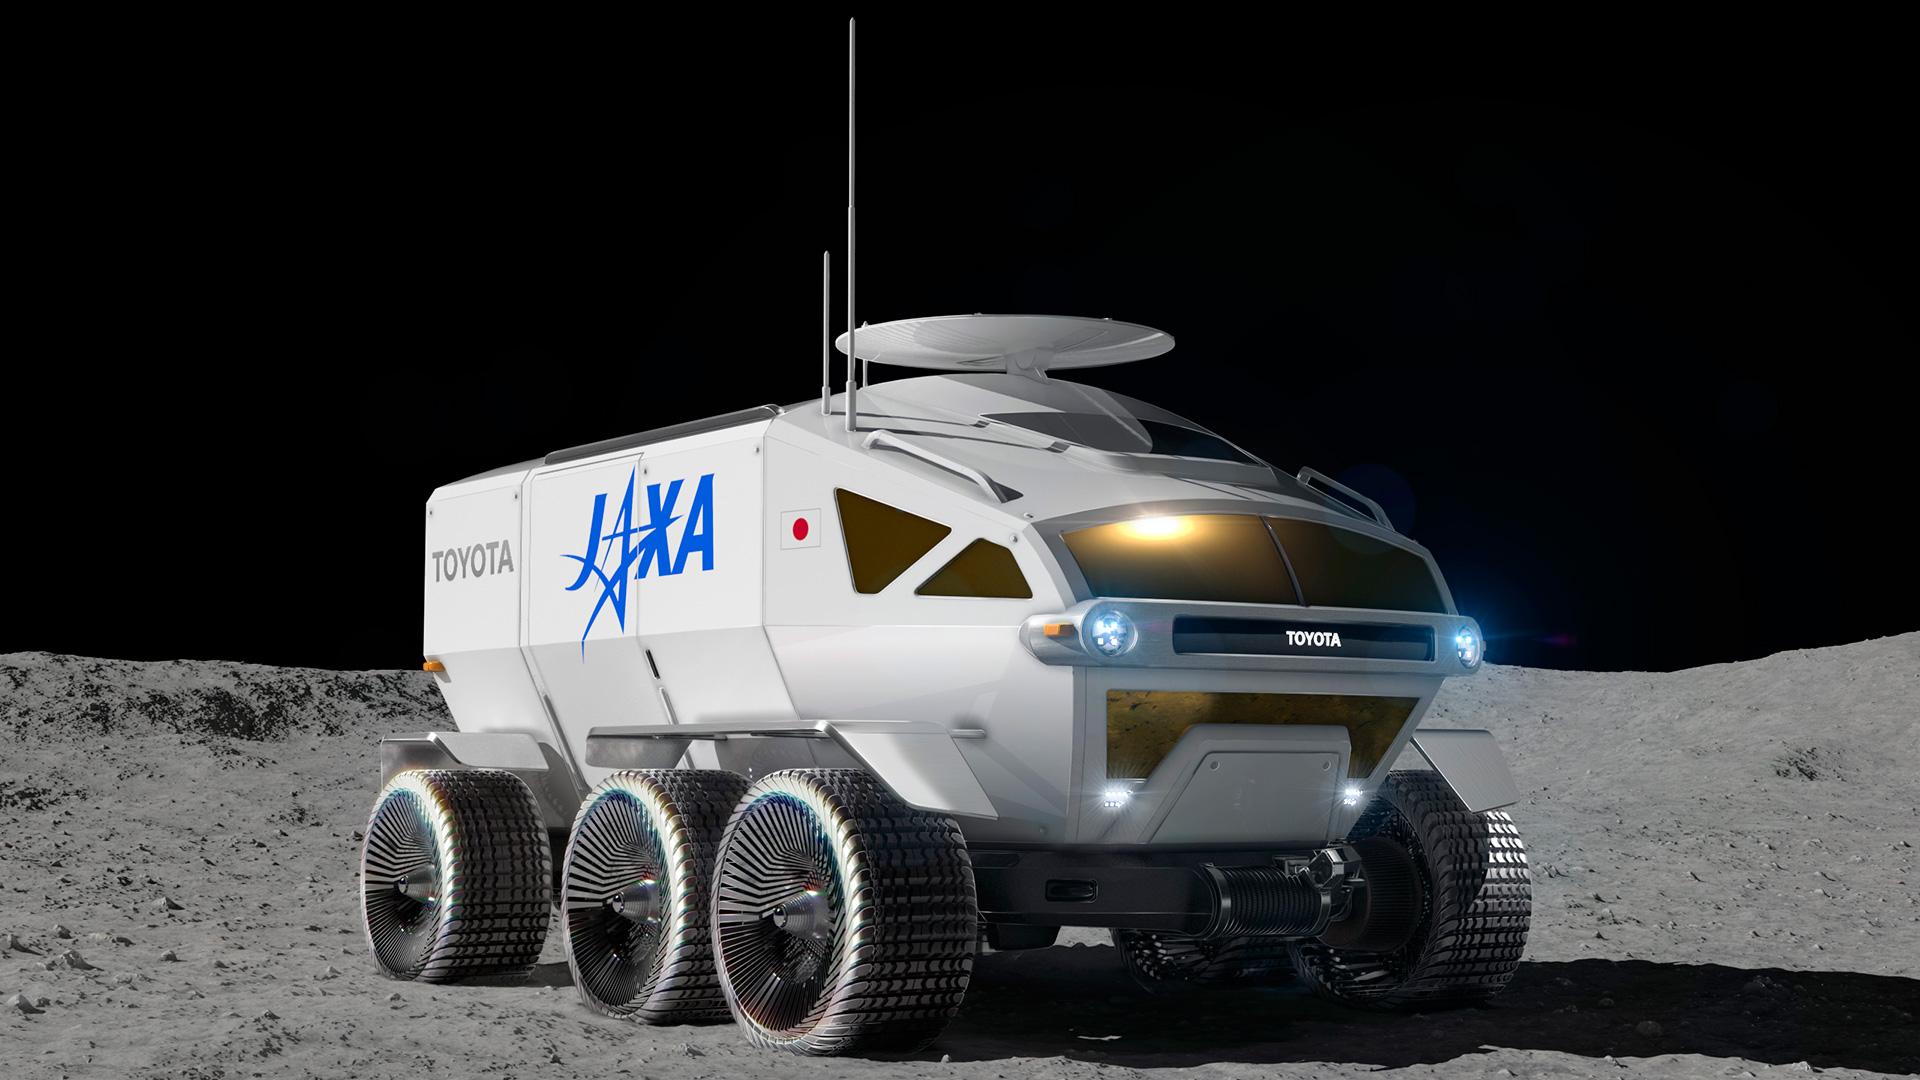 JAXA×トヨタ | 月面でのモビリティ「有人与圧ローバ」の実現に向け具体的な共同研究に着手